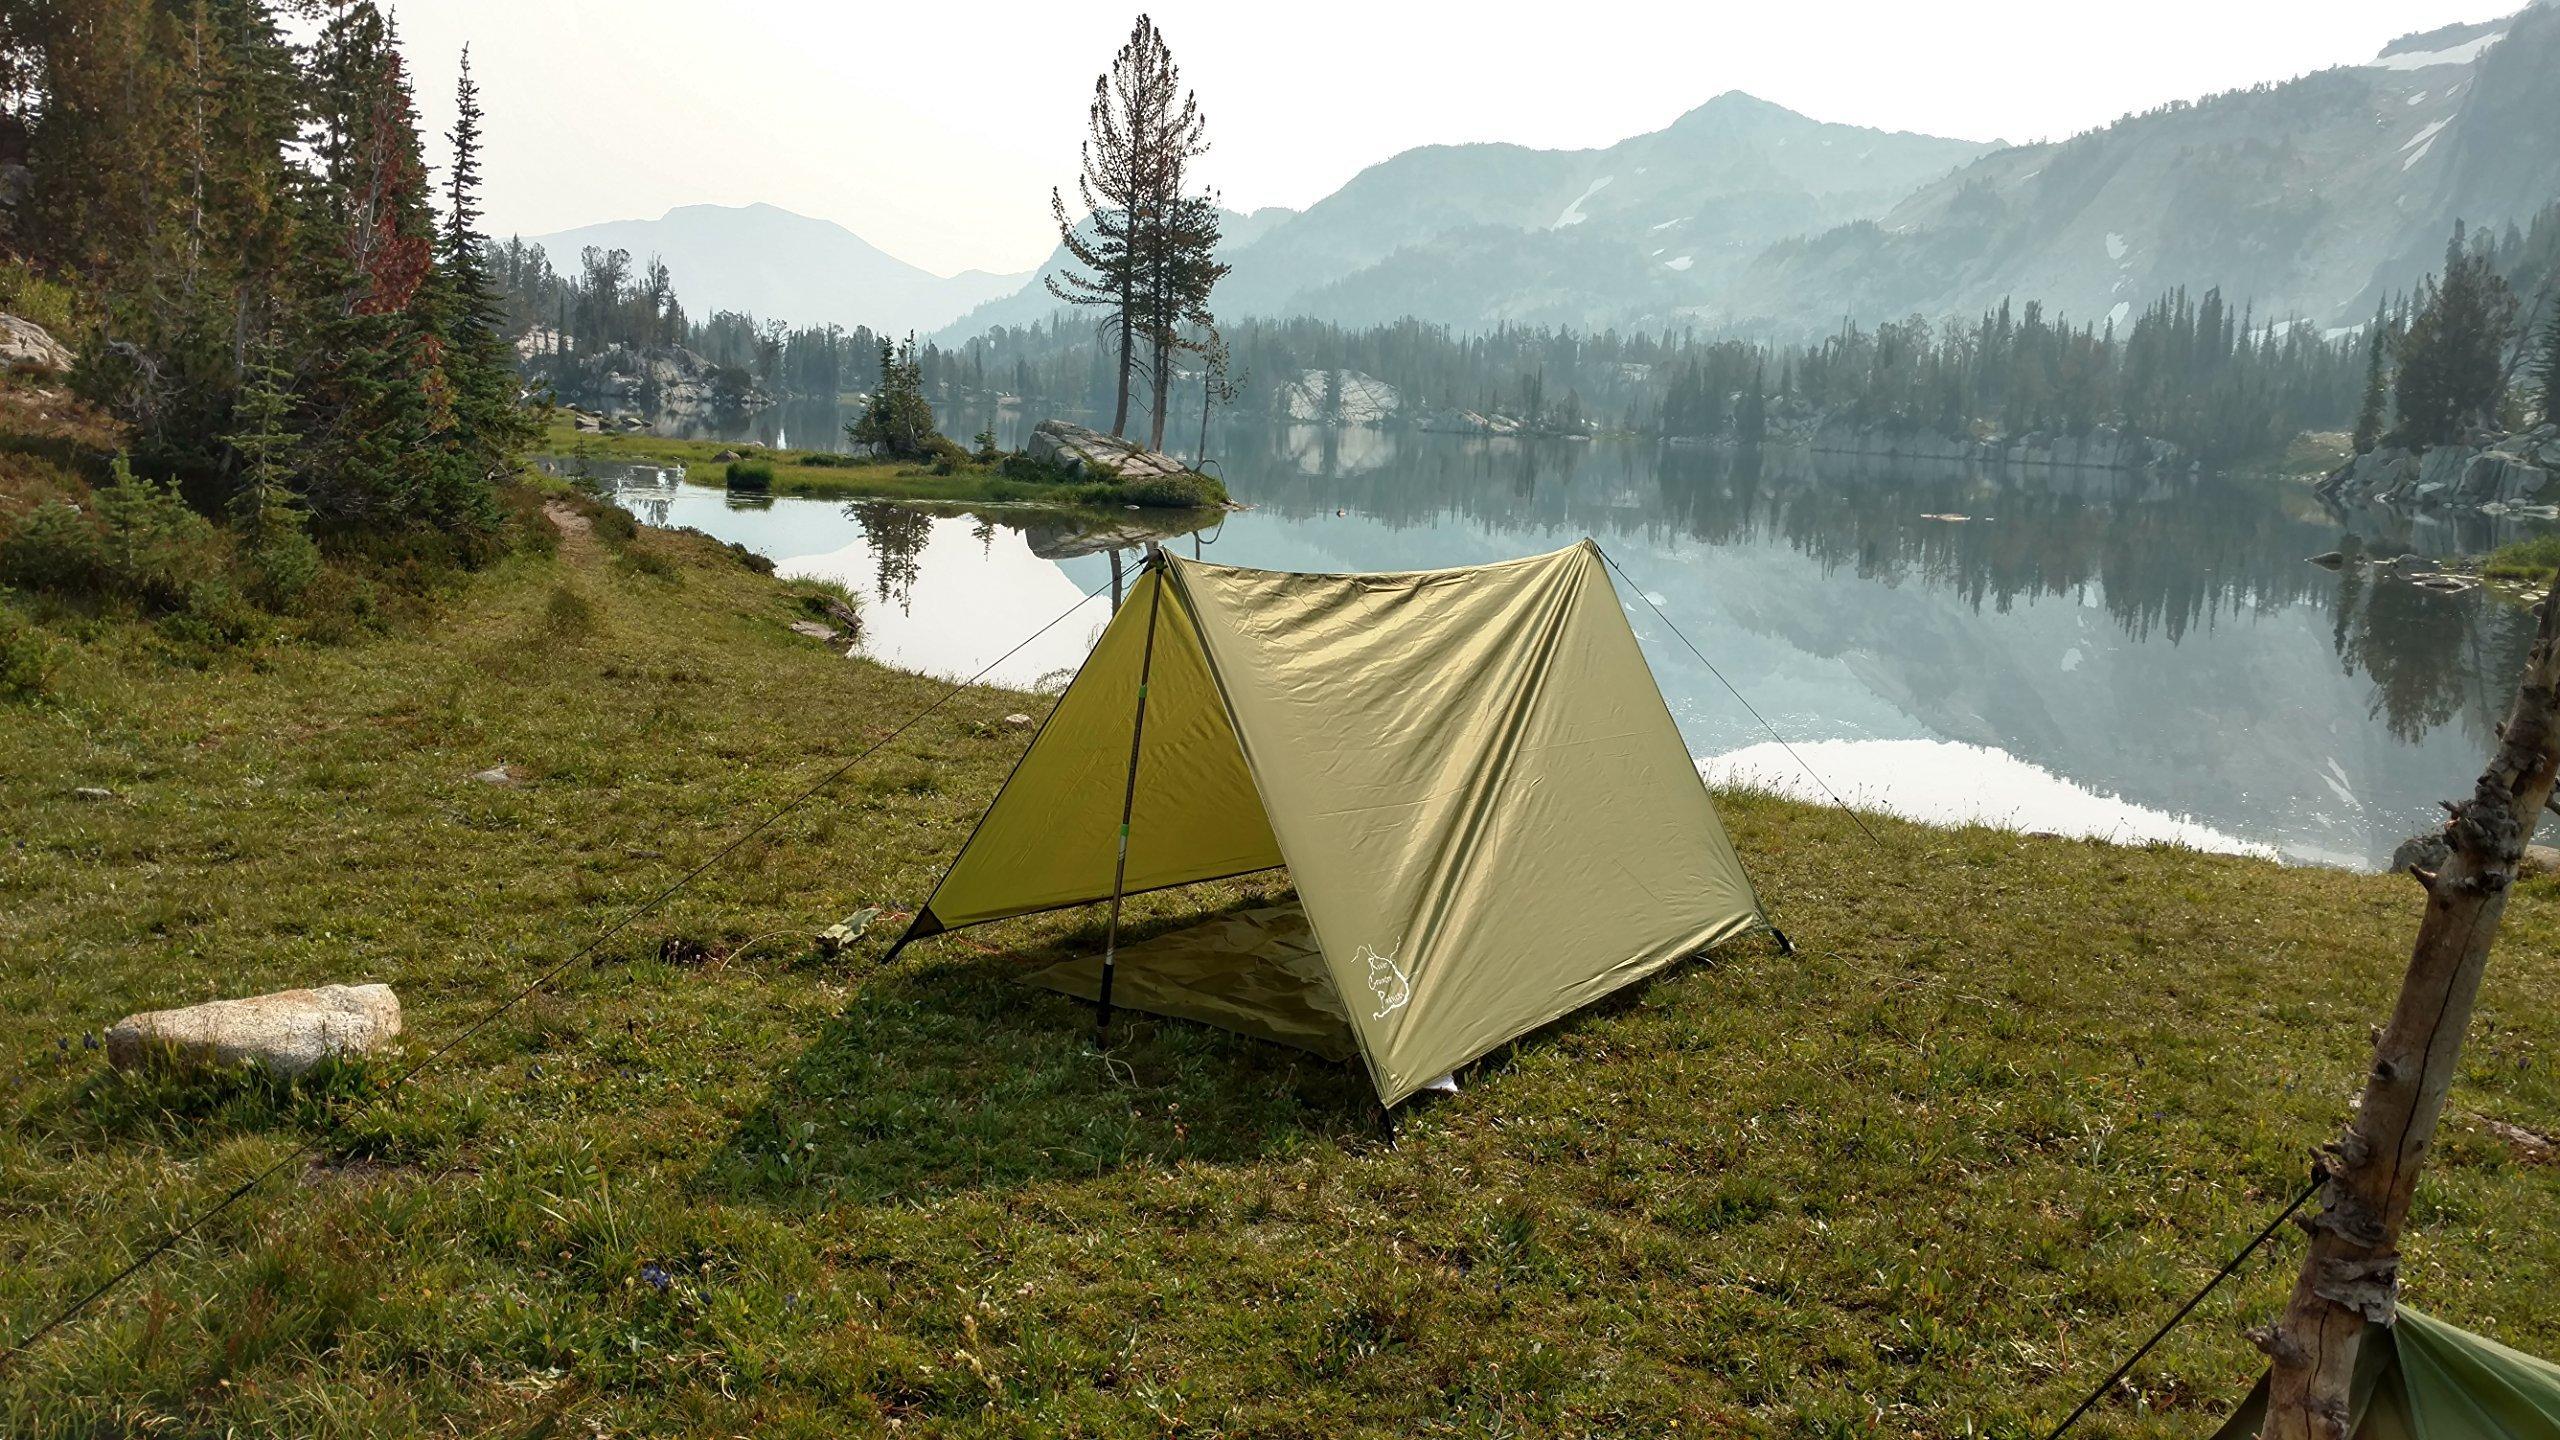 Trekking Pole Backpacking Tent, Backpacking Emergency Shelter, Hammock Rain Fly, Trekking Pole Tent